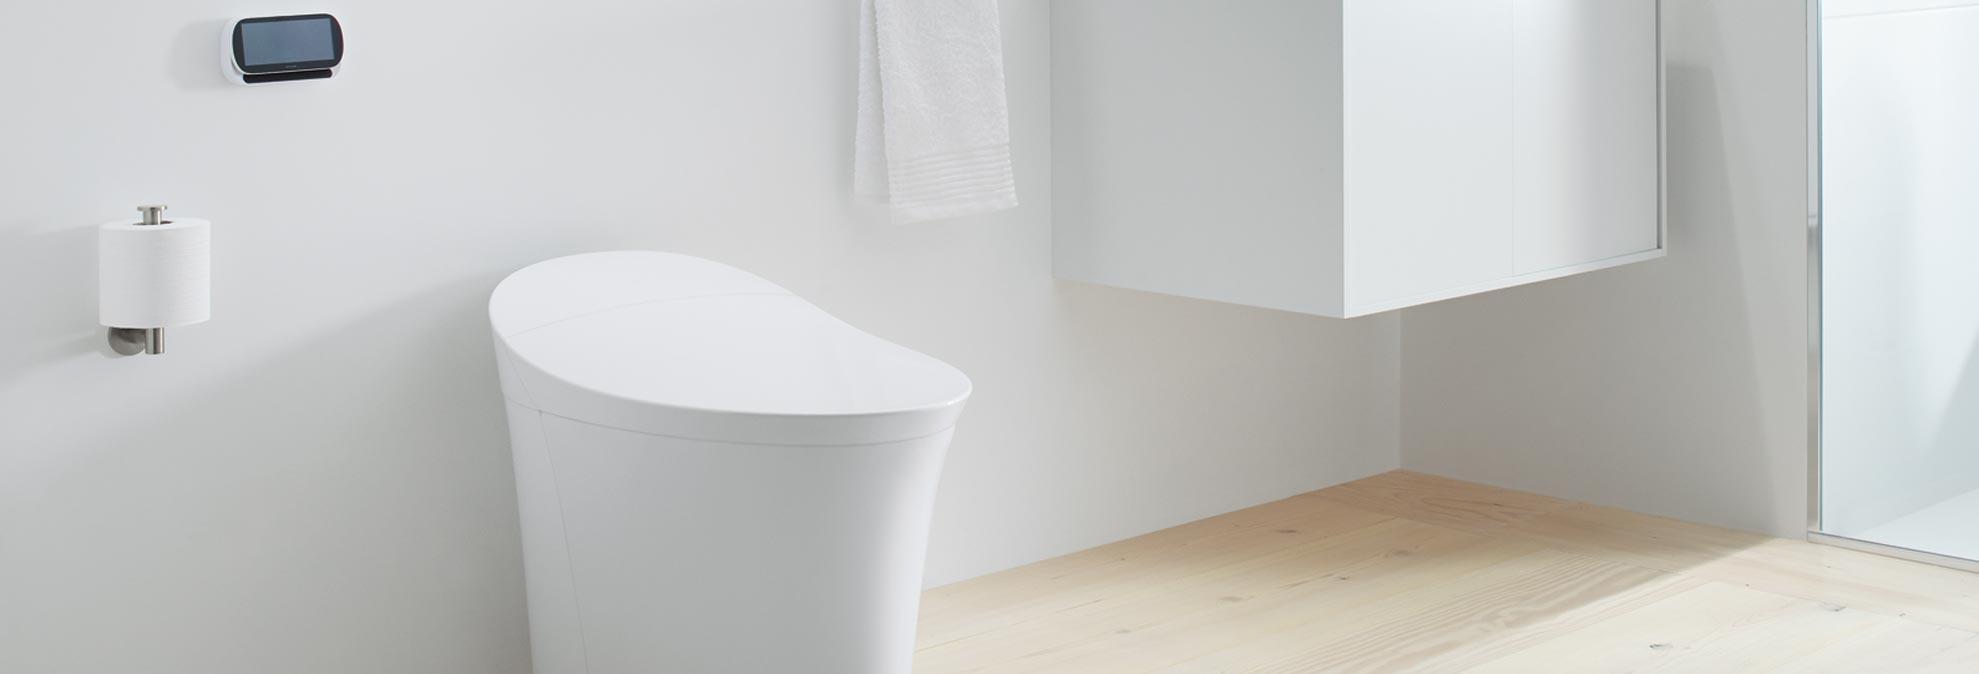 Best toilet on the market 2016 - Best Toilet On The Market 2016 49